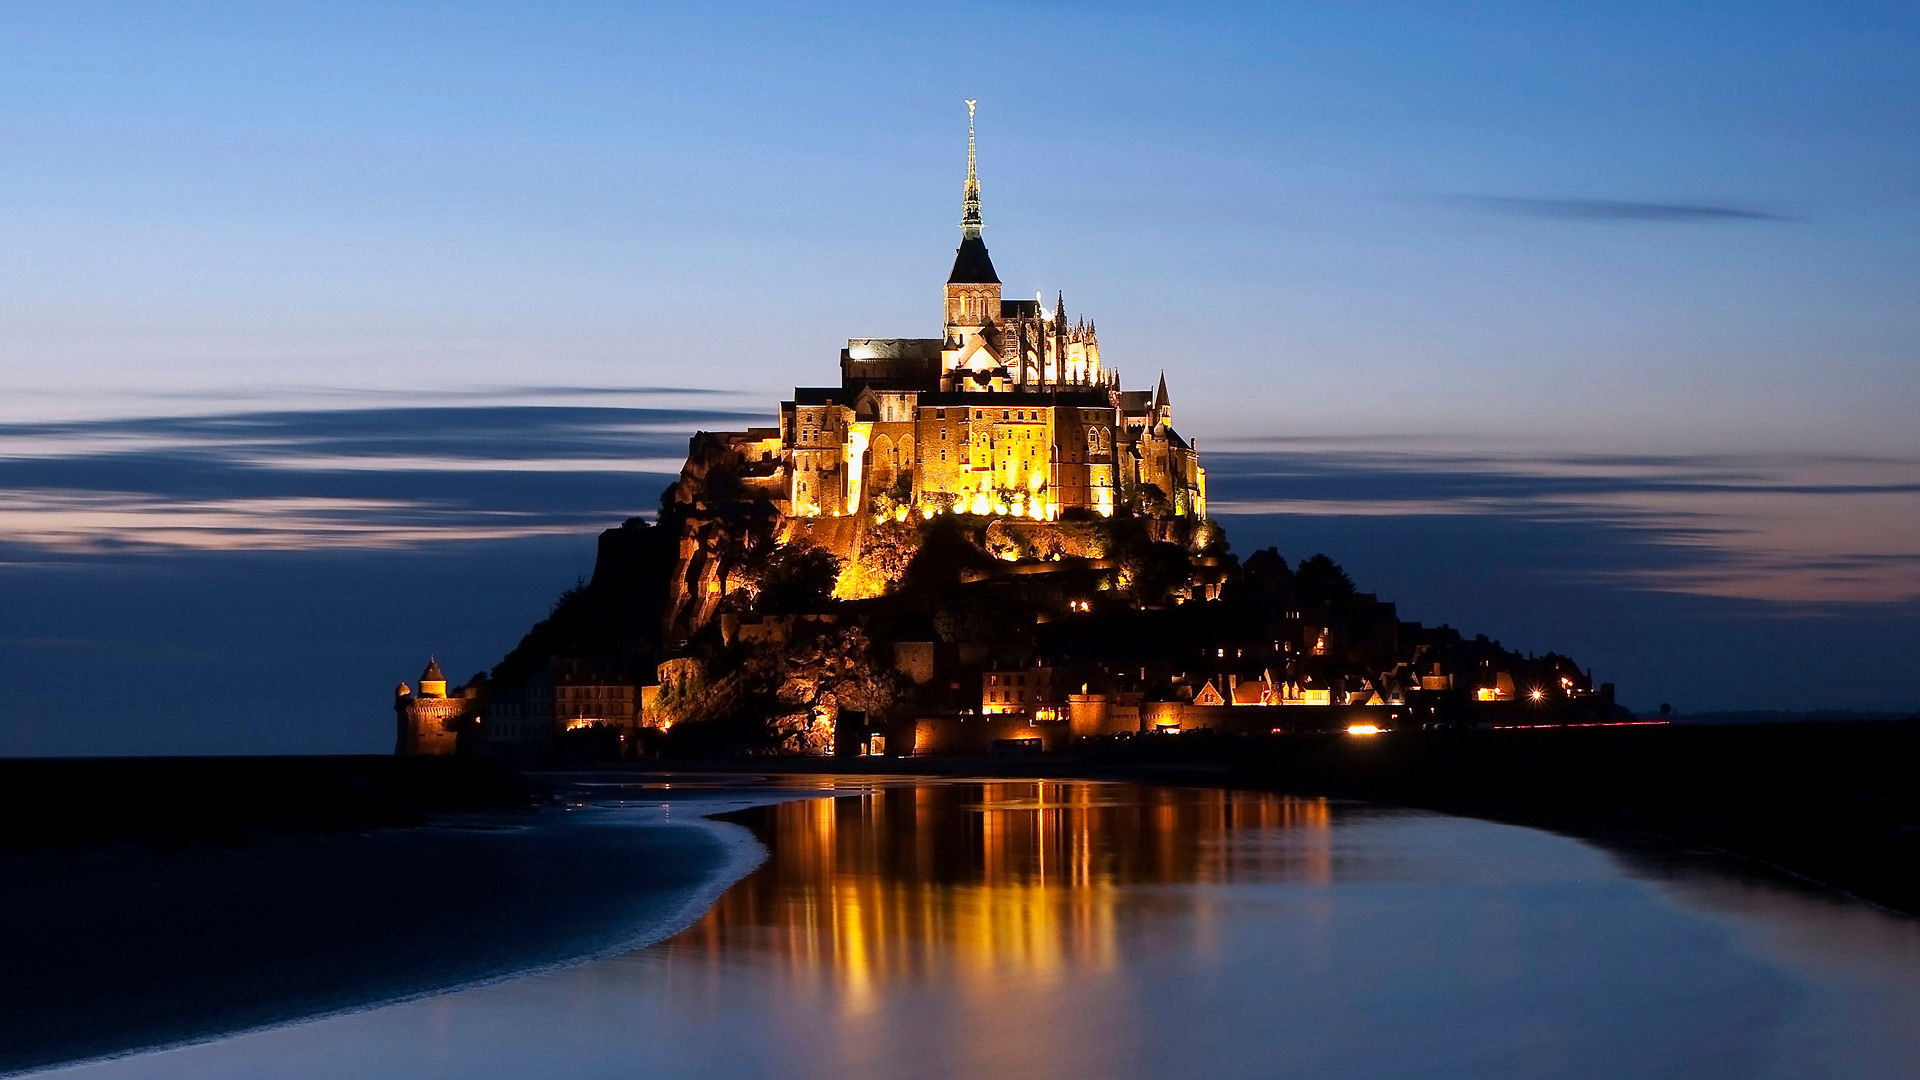 Fonds d 39 cran mont saint michel maximumwall for Fond ecran iphone paysage